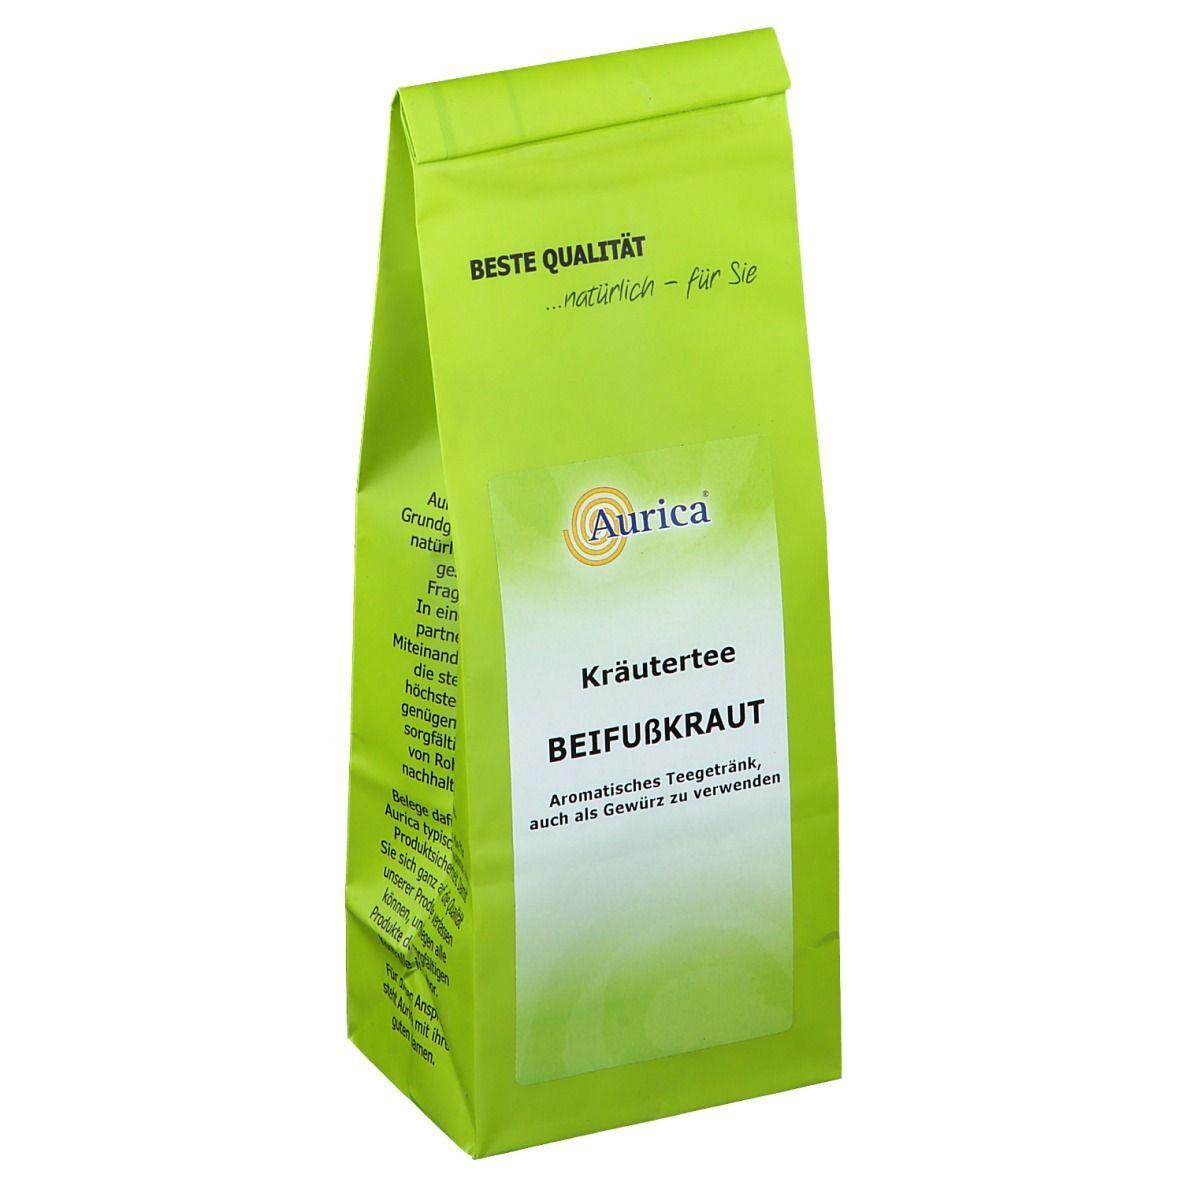 Image of Aurica® Beifusskraut-Tee geschnitten